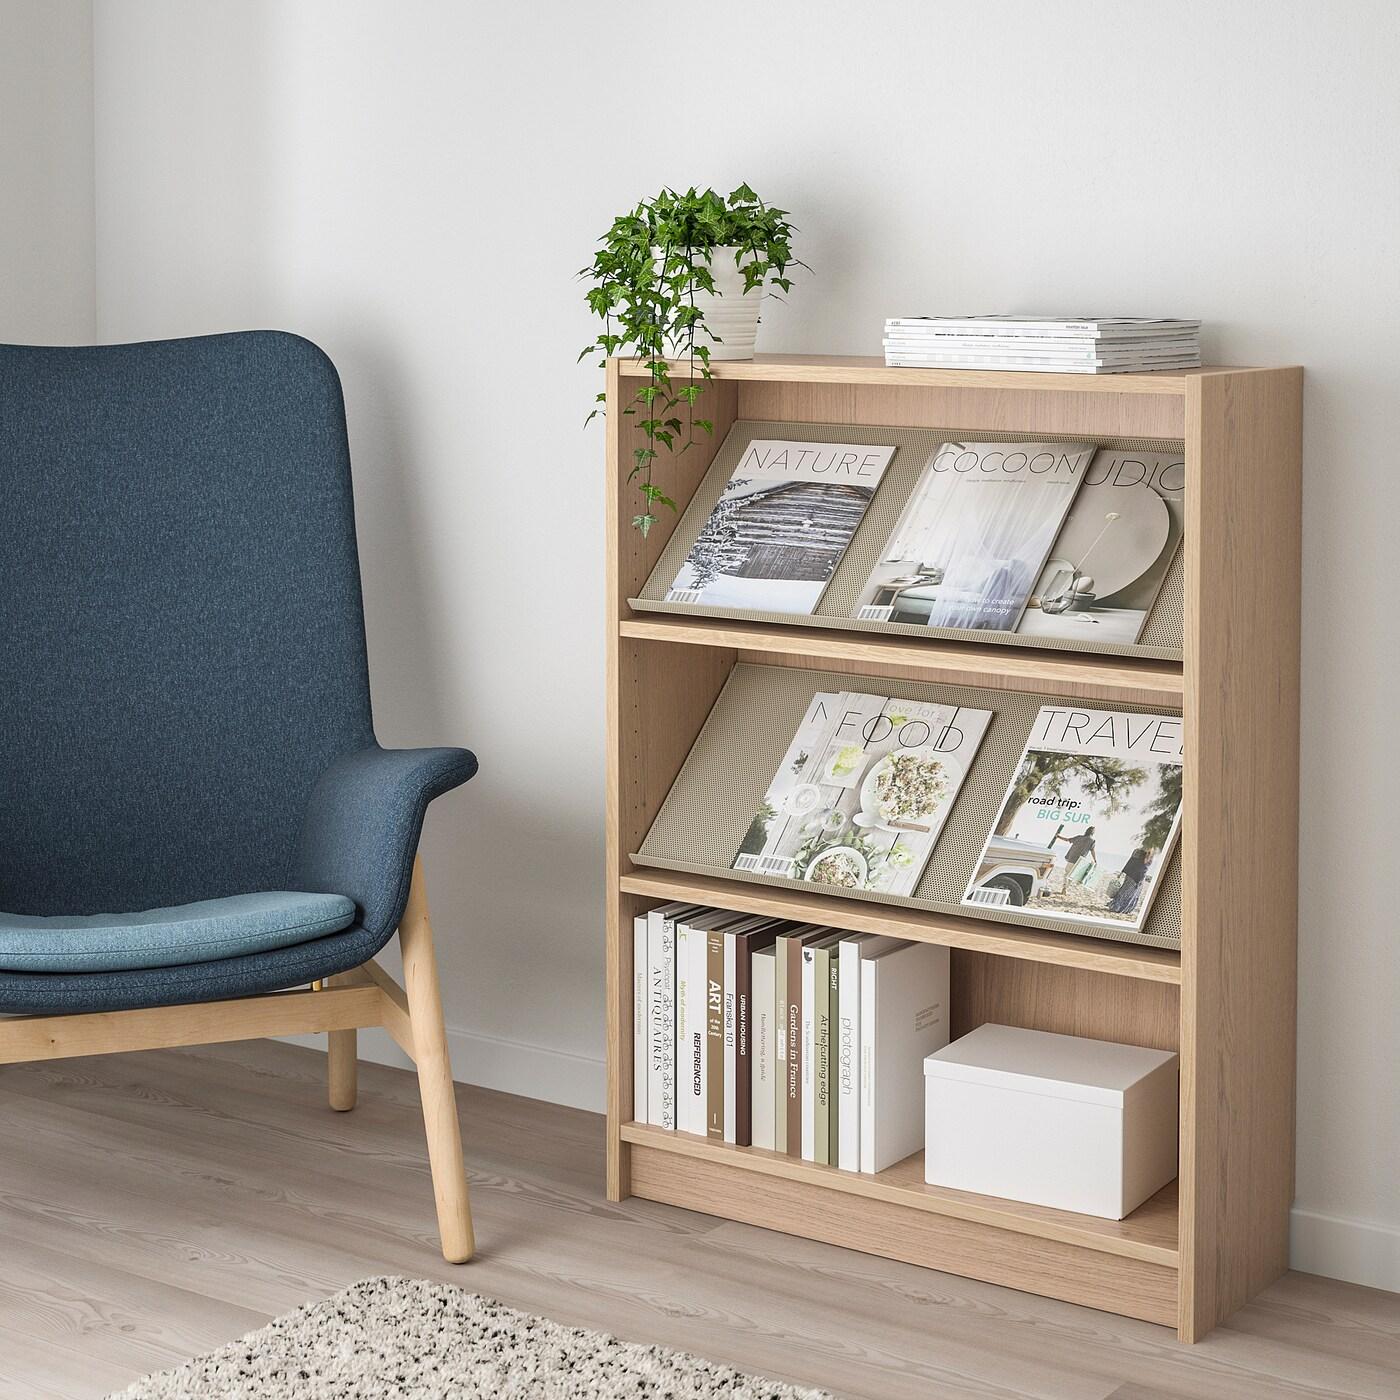 Full Size of Modulküche Holz Ikea Wohnzimmer Modulküche Cocoon